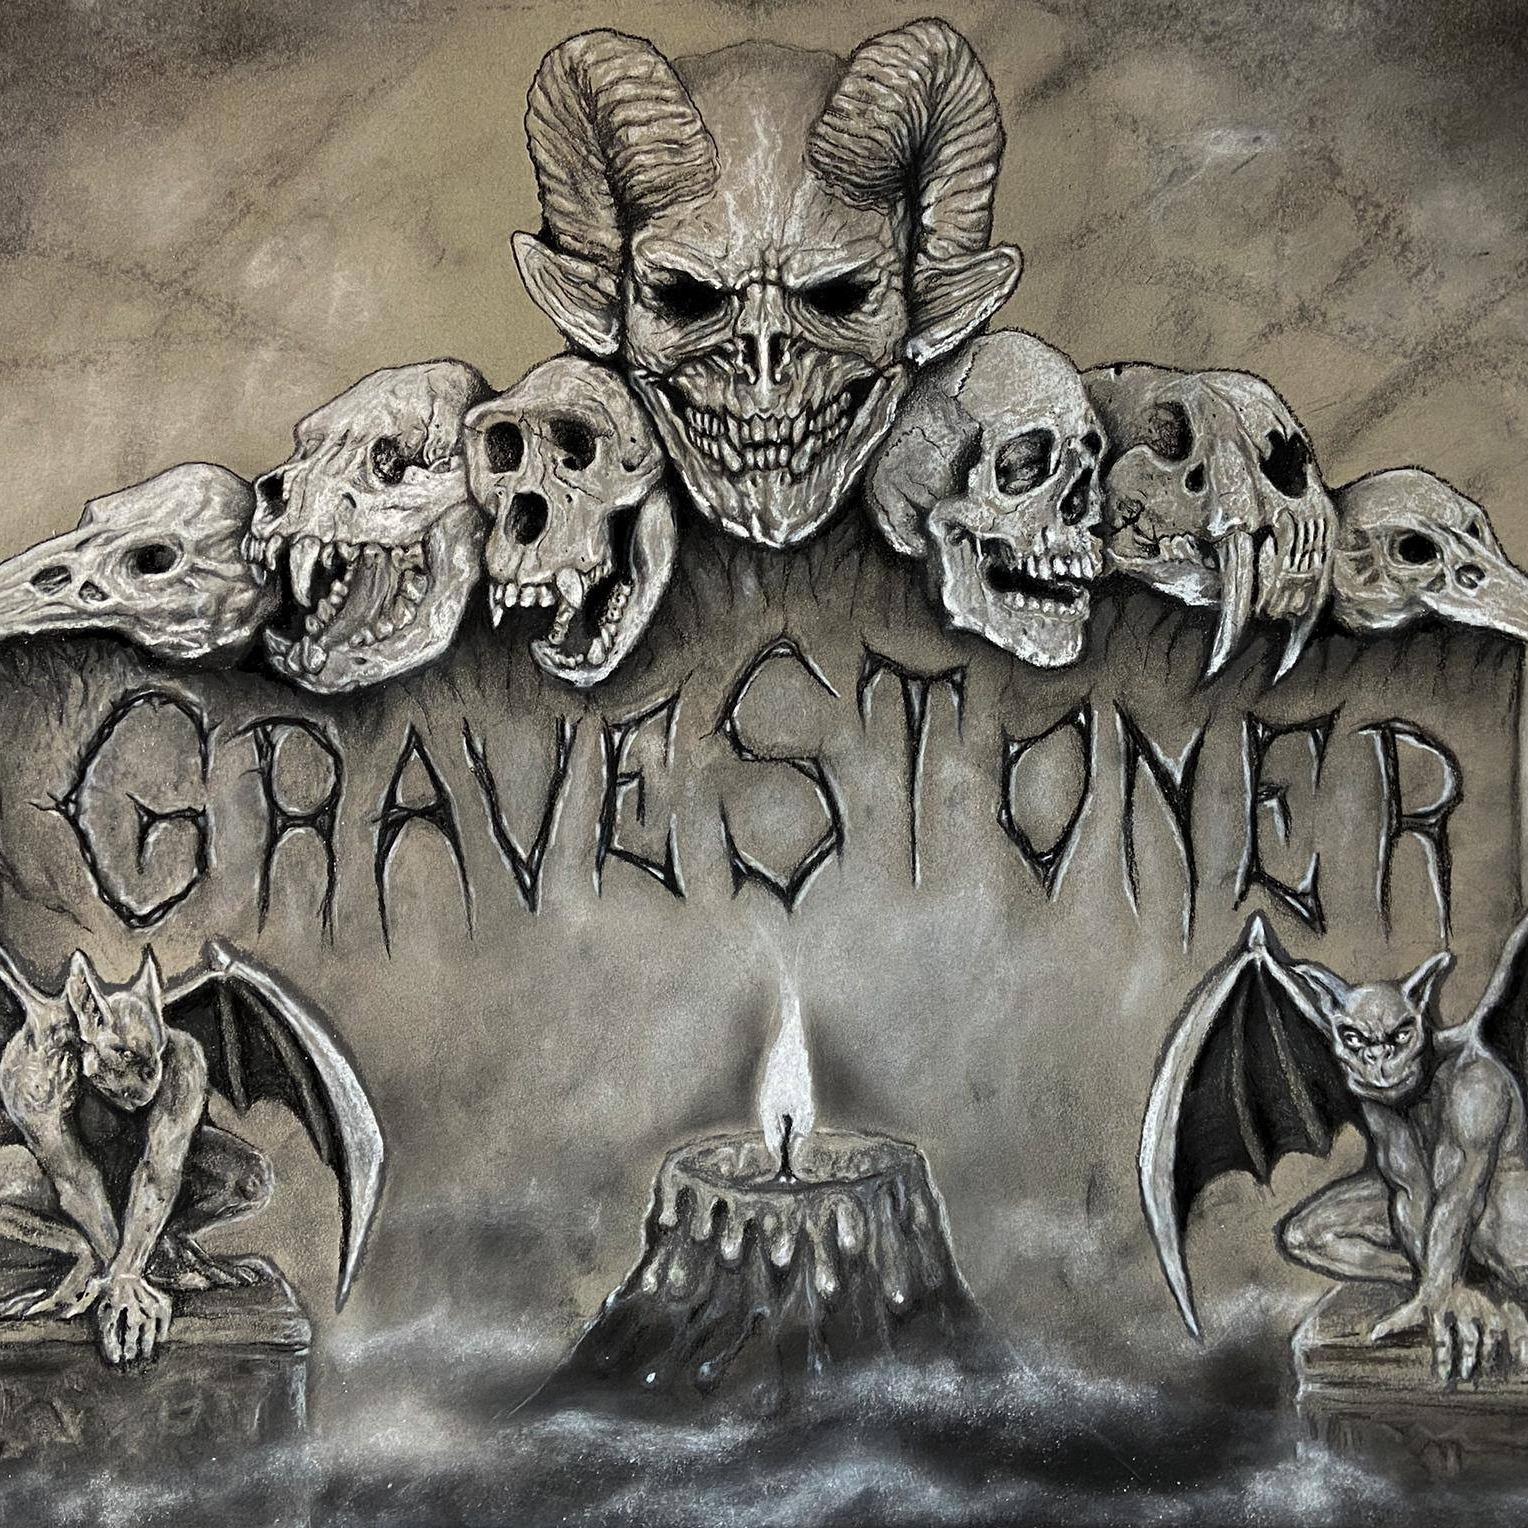 Gravestoner: La banda asturiana presenta su primer EP